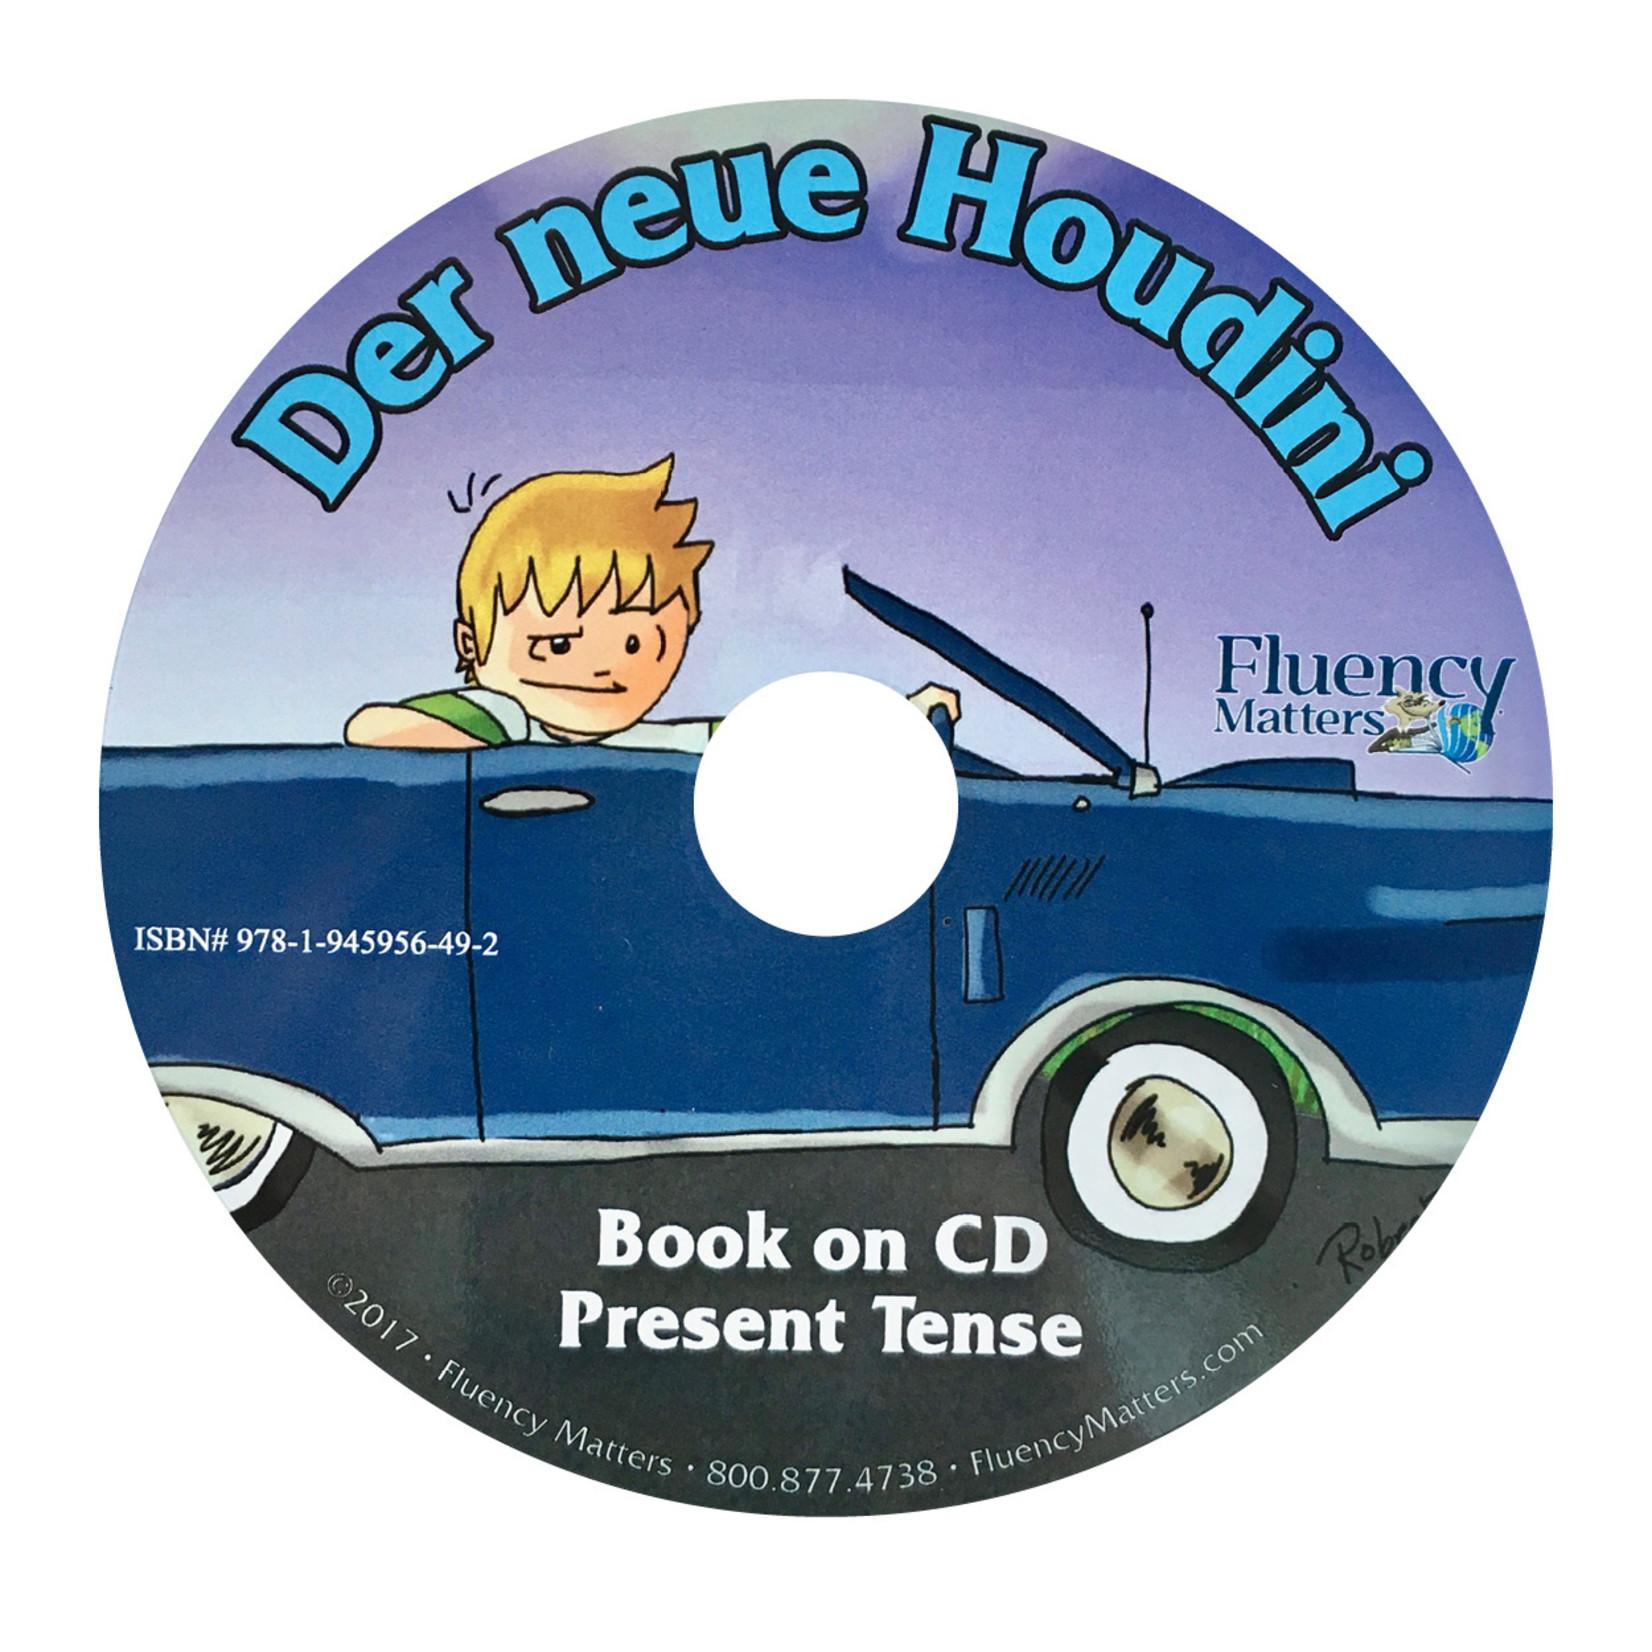 Fluency Matters Der neue Houdini - Luisterboek